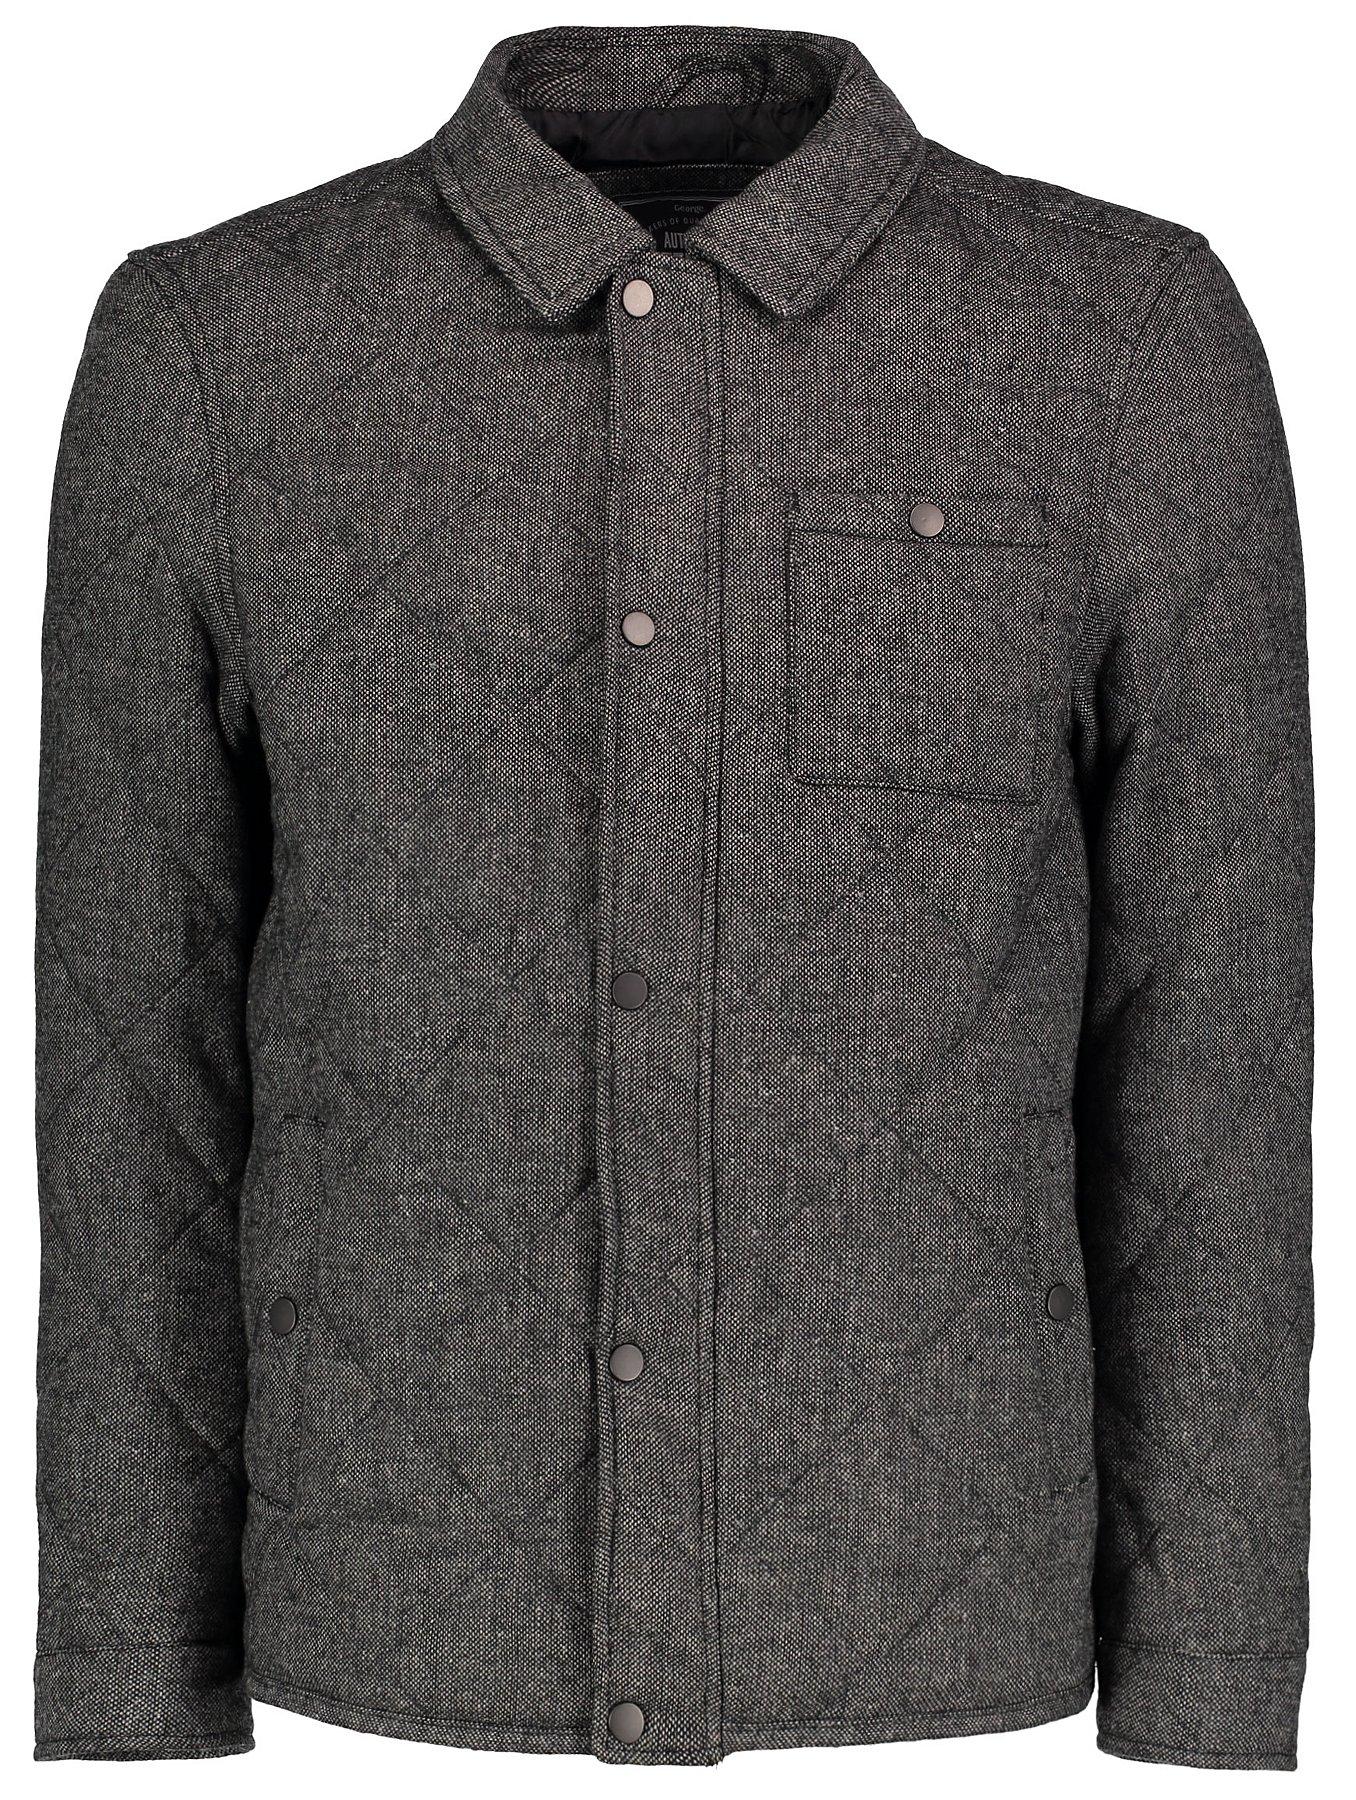 Wool-Blend Padded Shirt   Men   George